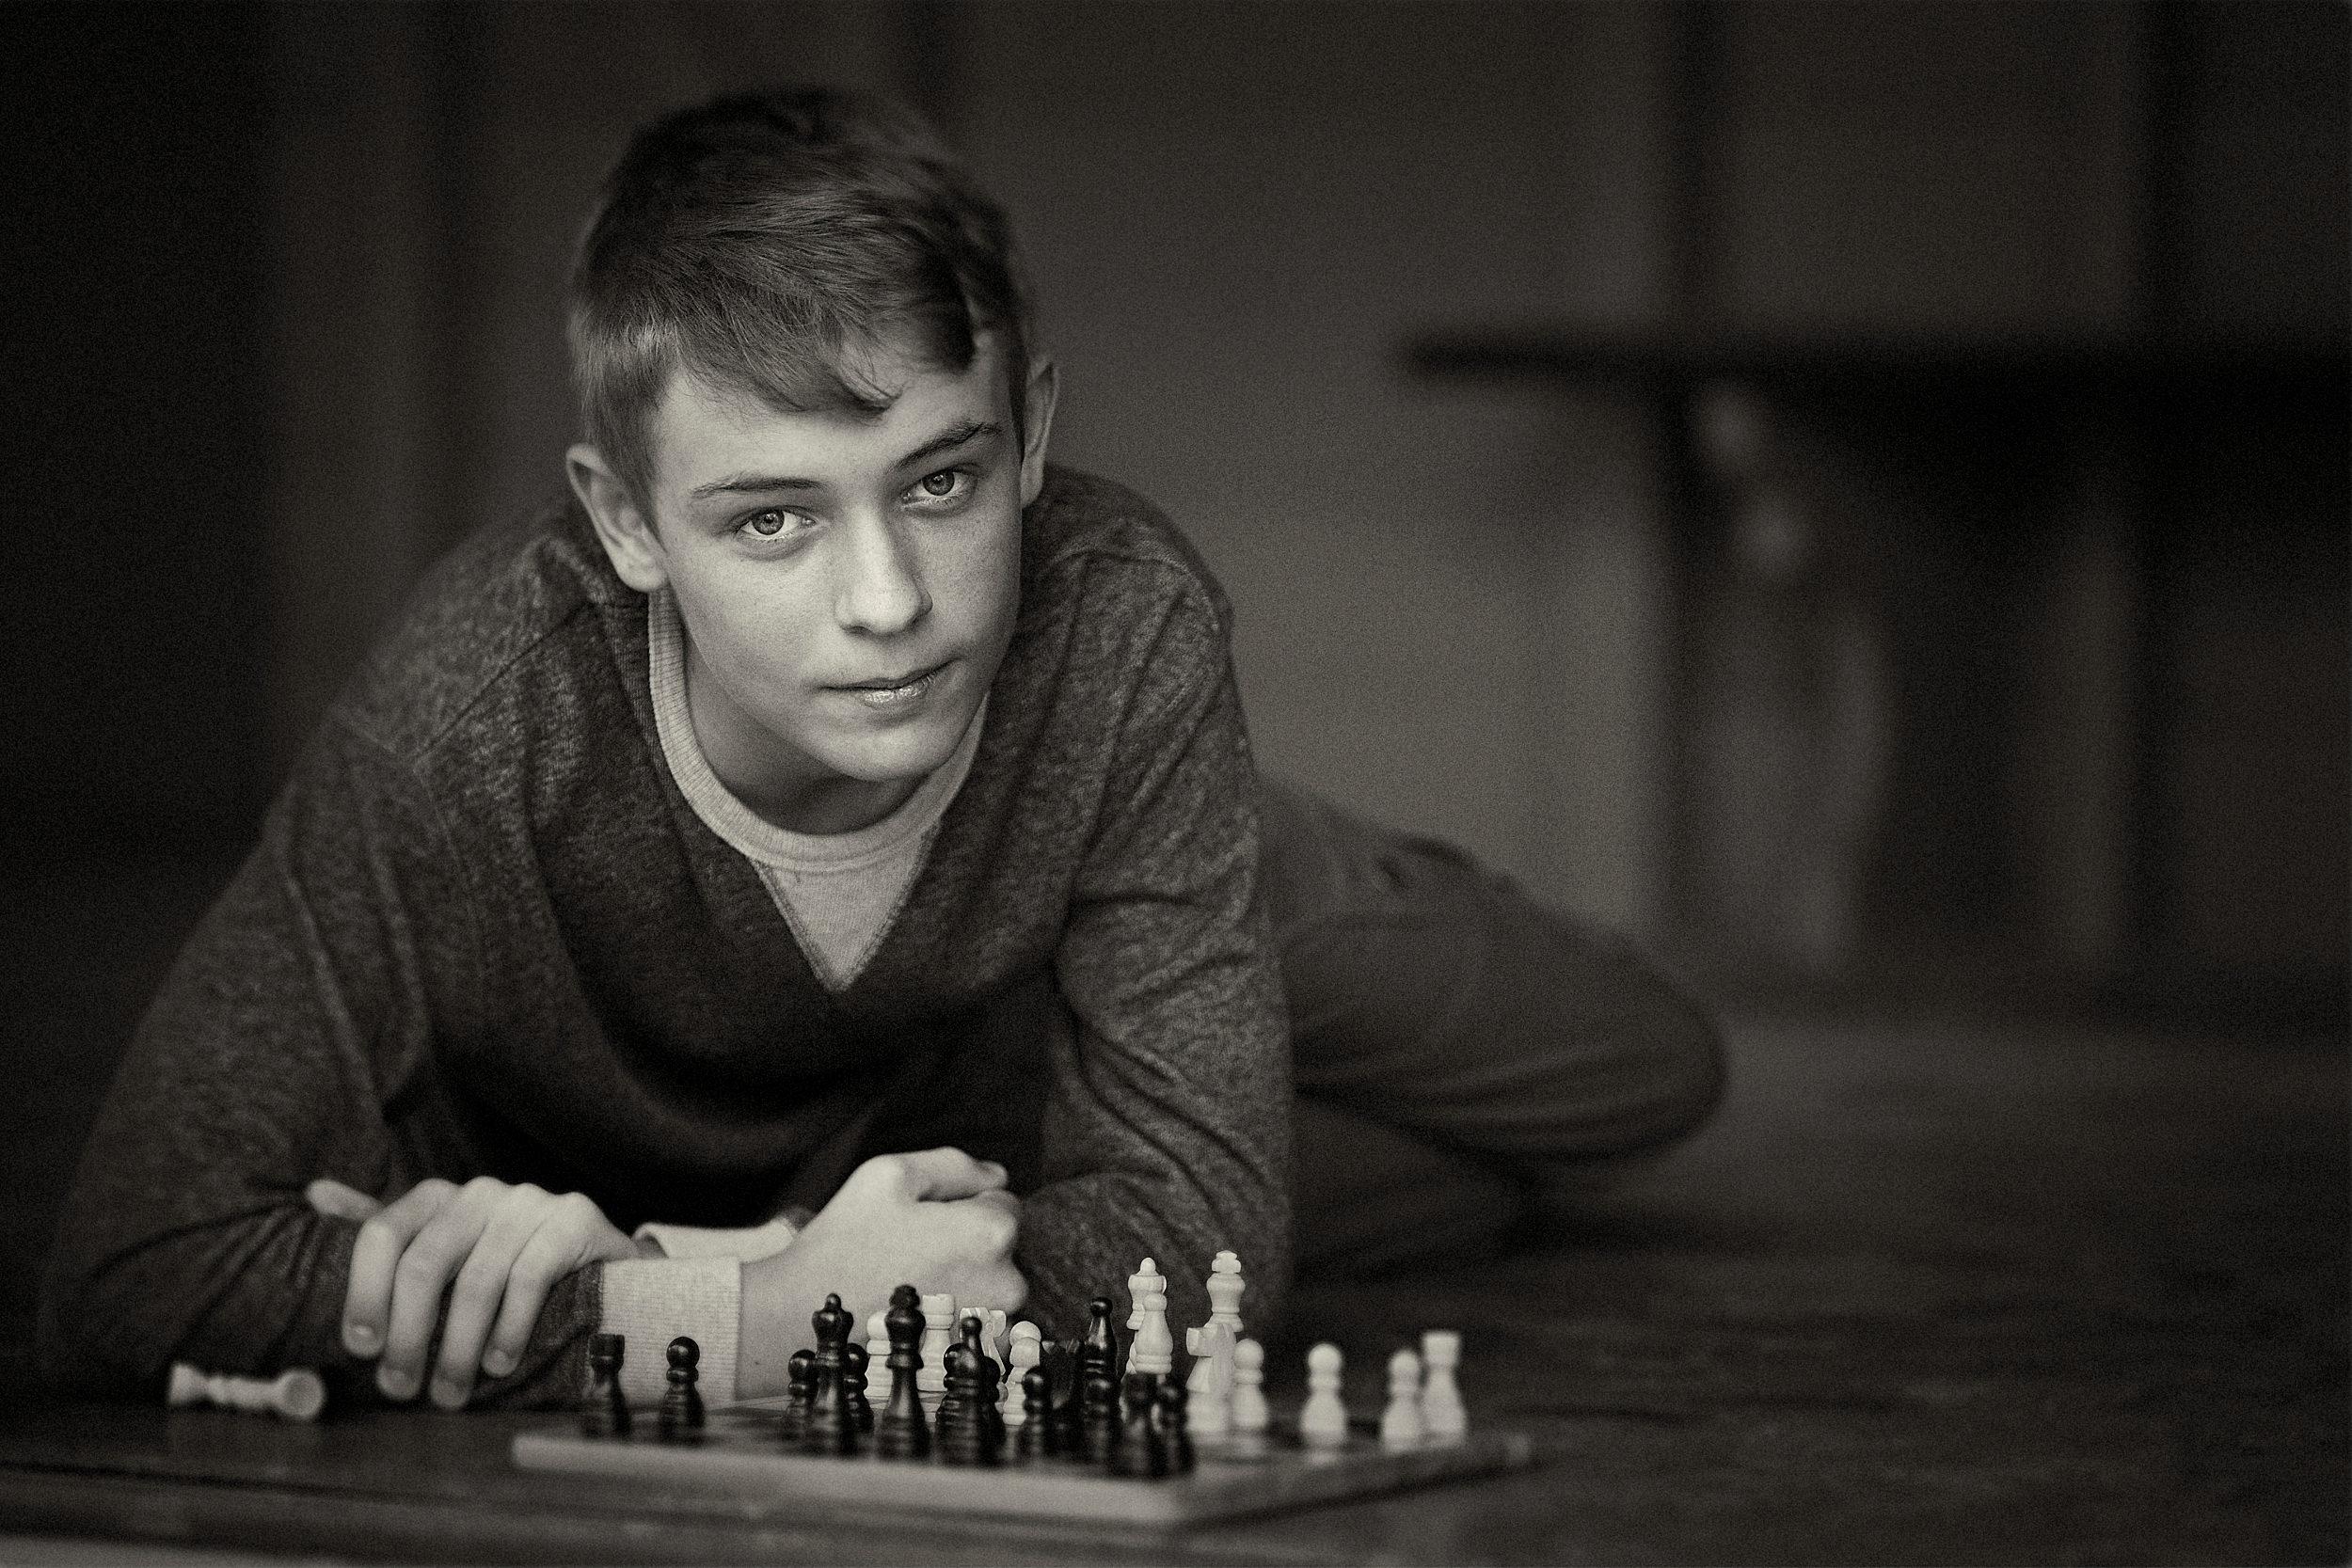 Gallery-teenage portraits-black and white portraits.jpg